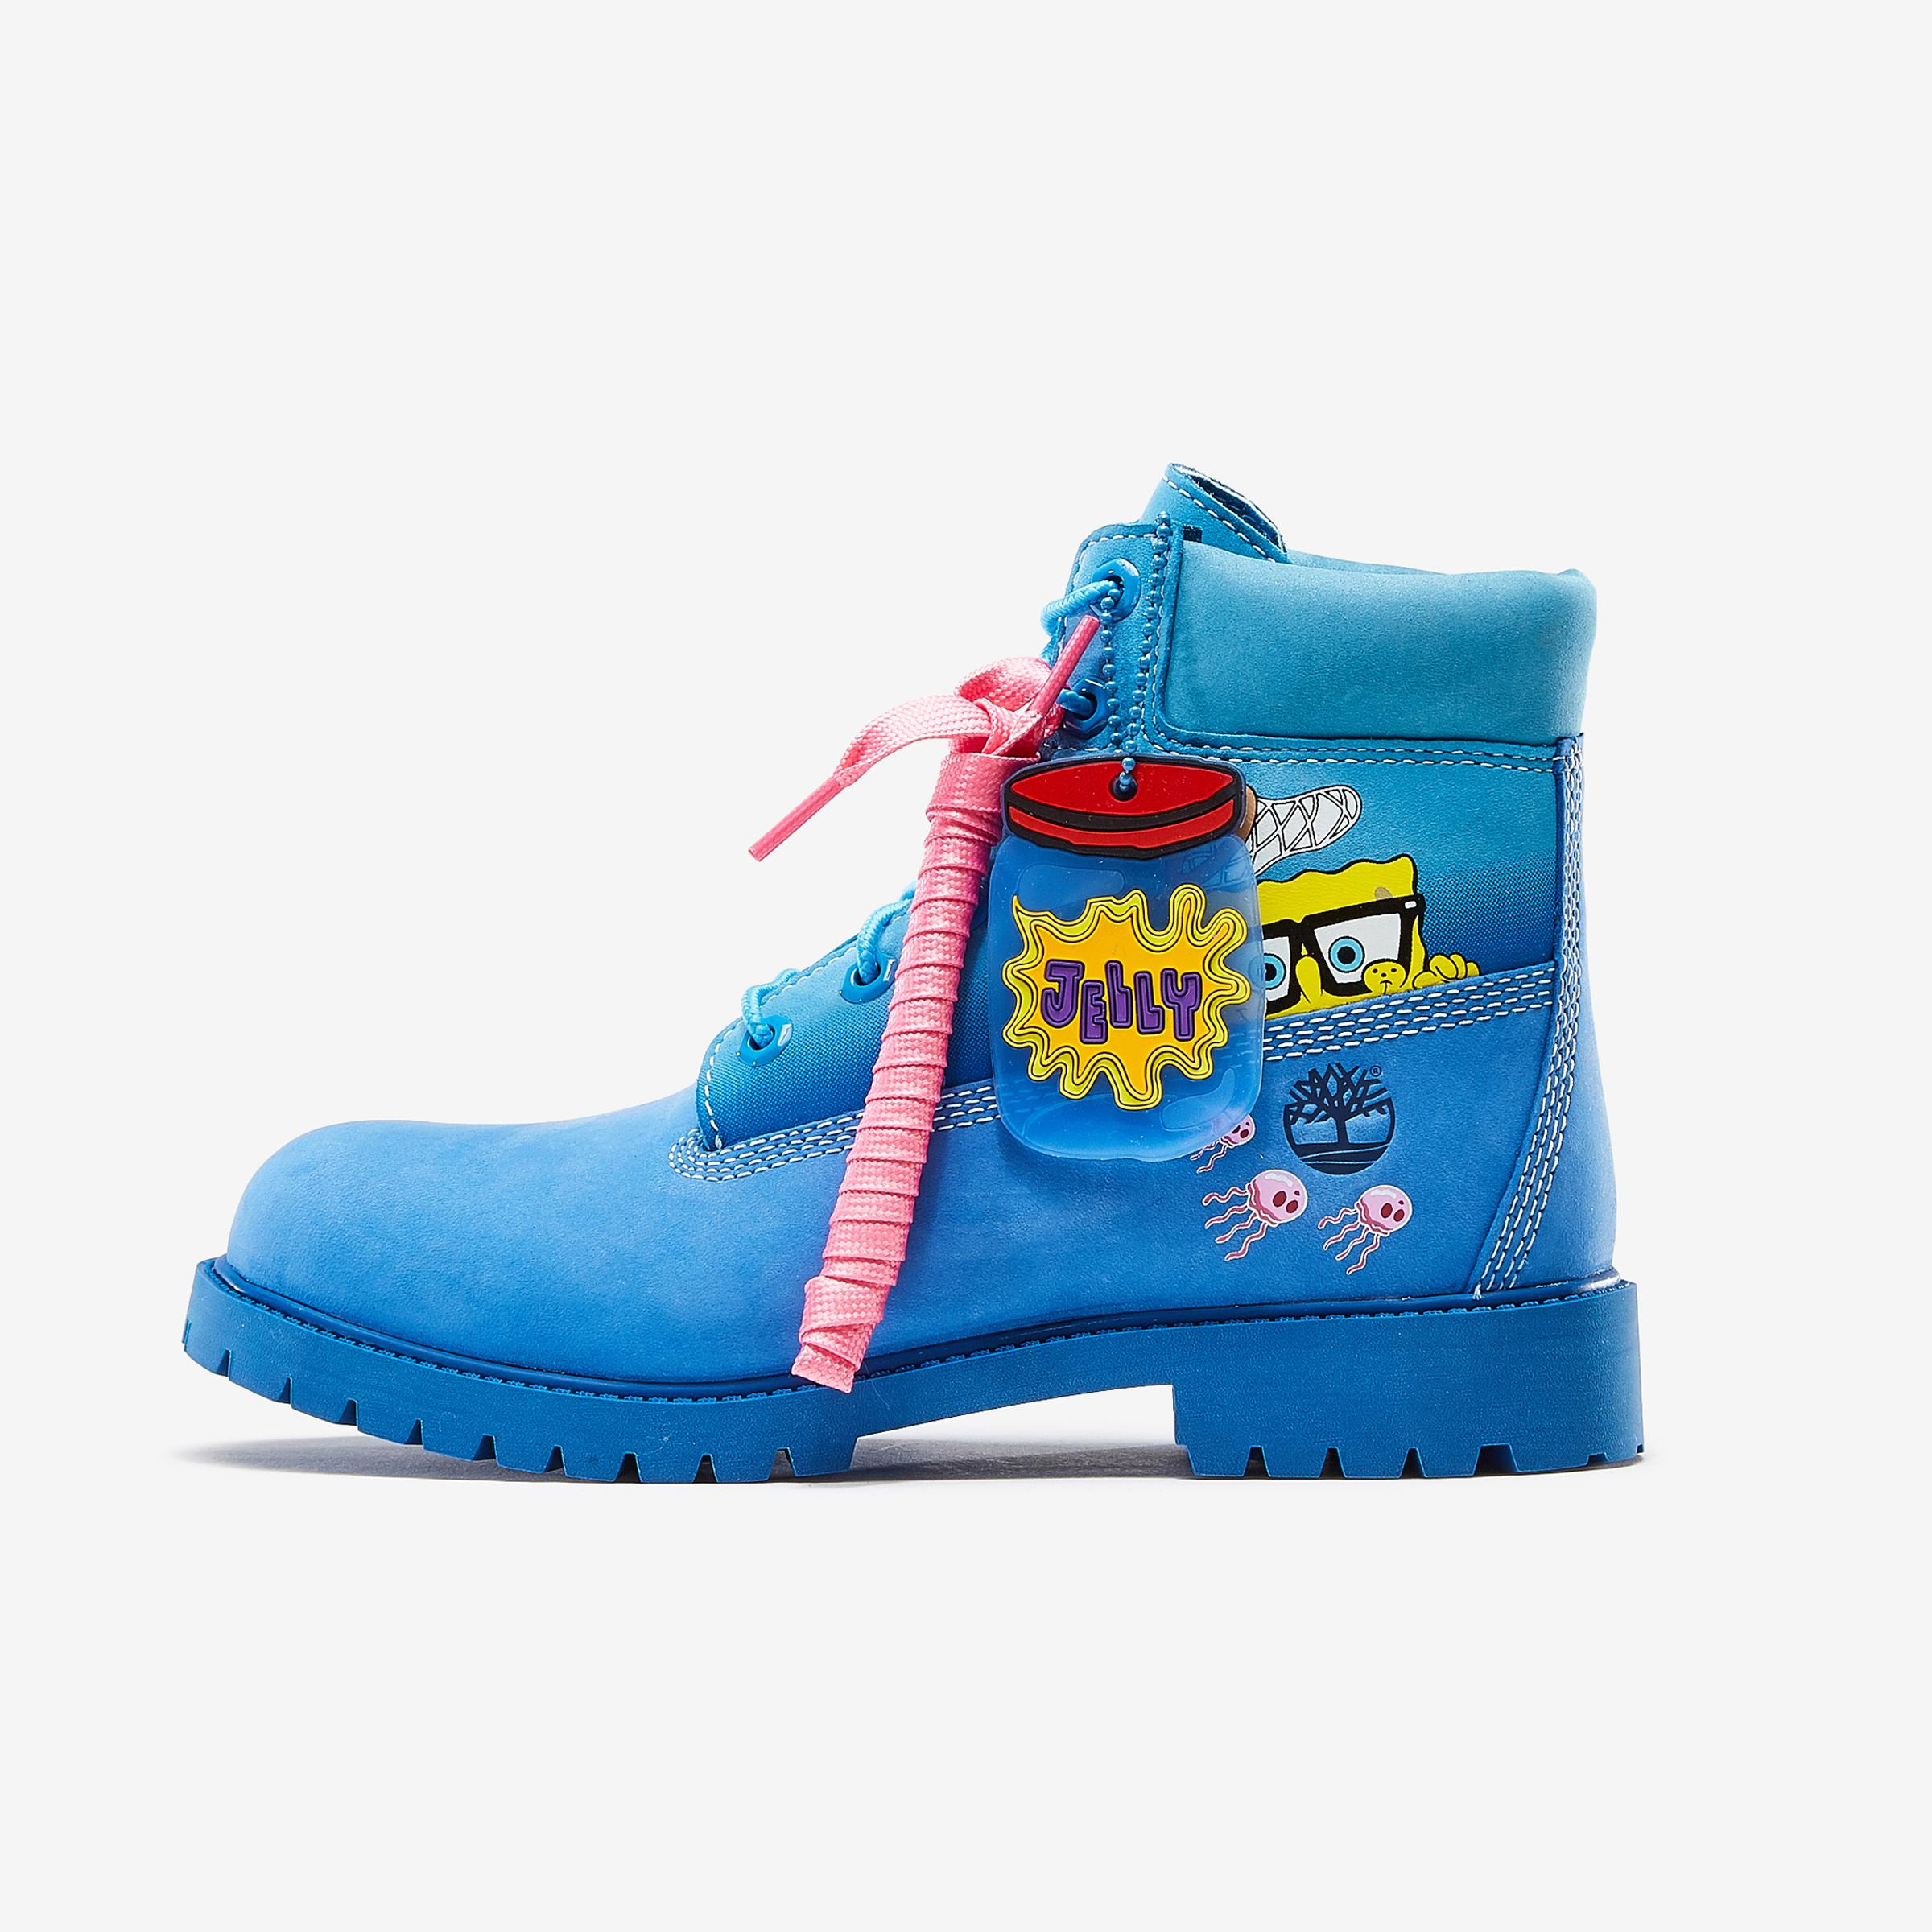 Junior SpongeBob x Timberland 6 Inch Premium Waterproof